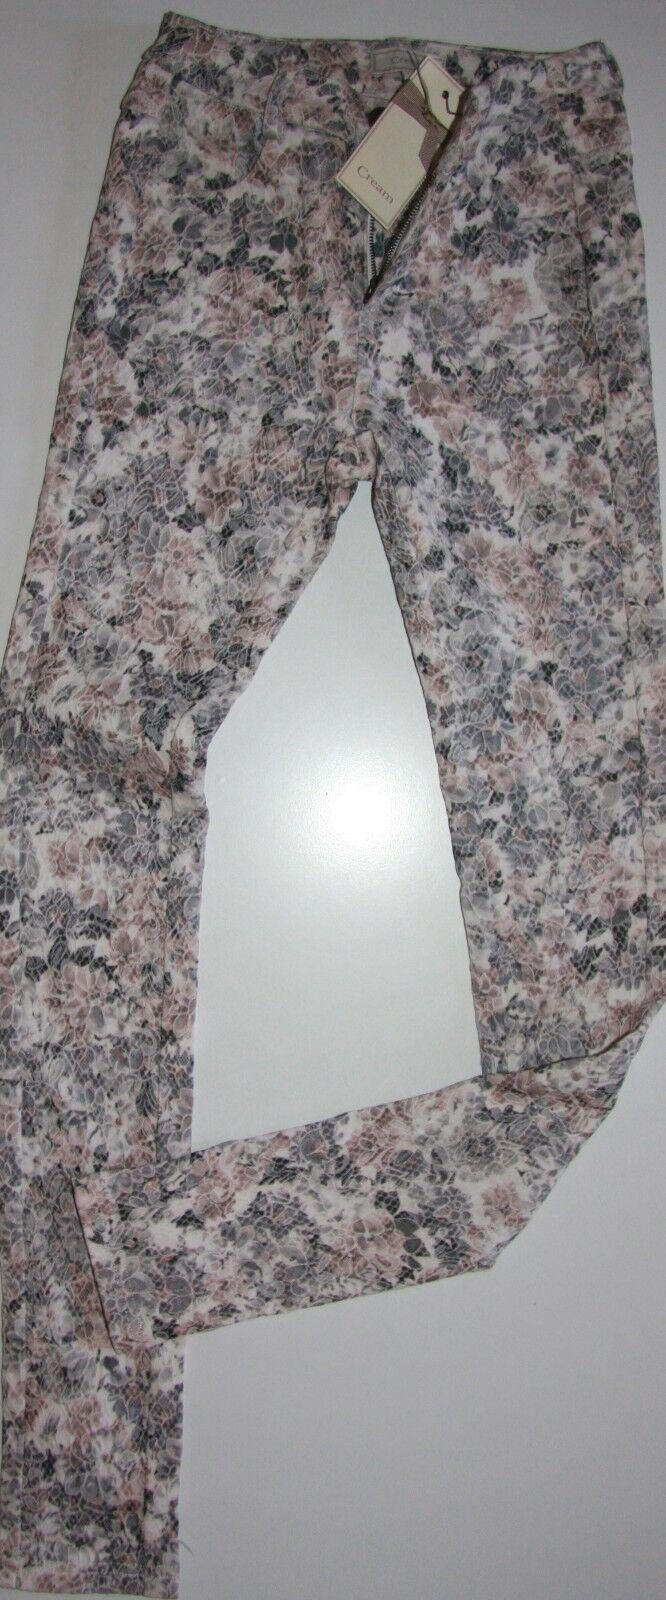 Cream DK Jeggings Hose Jeans Pants Laney  Lace Flower Pastell size 34-38  Neu